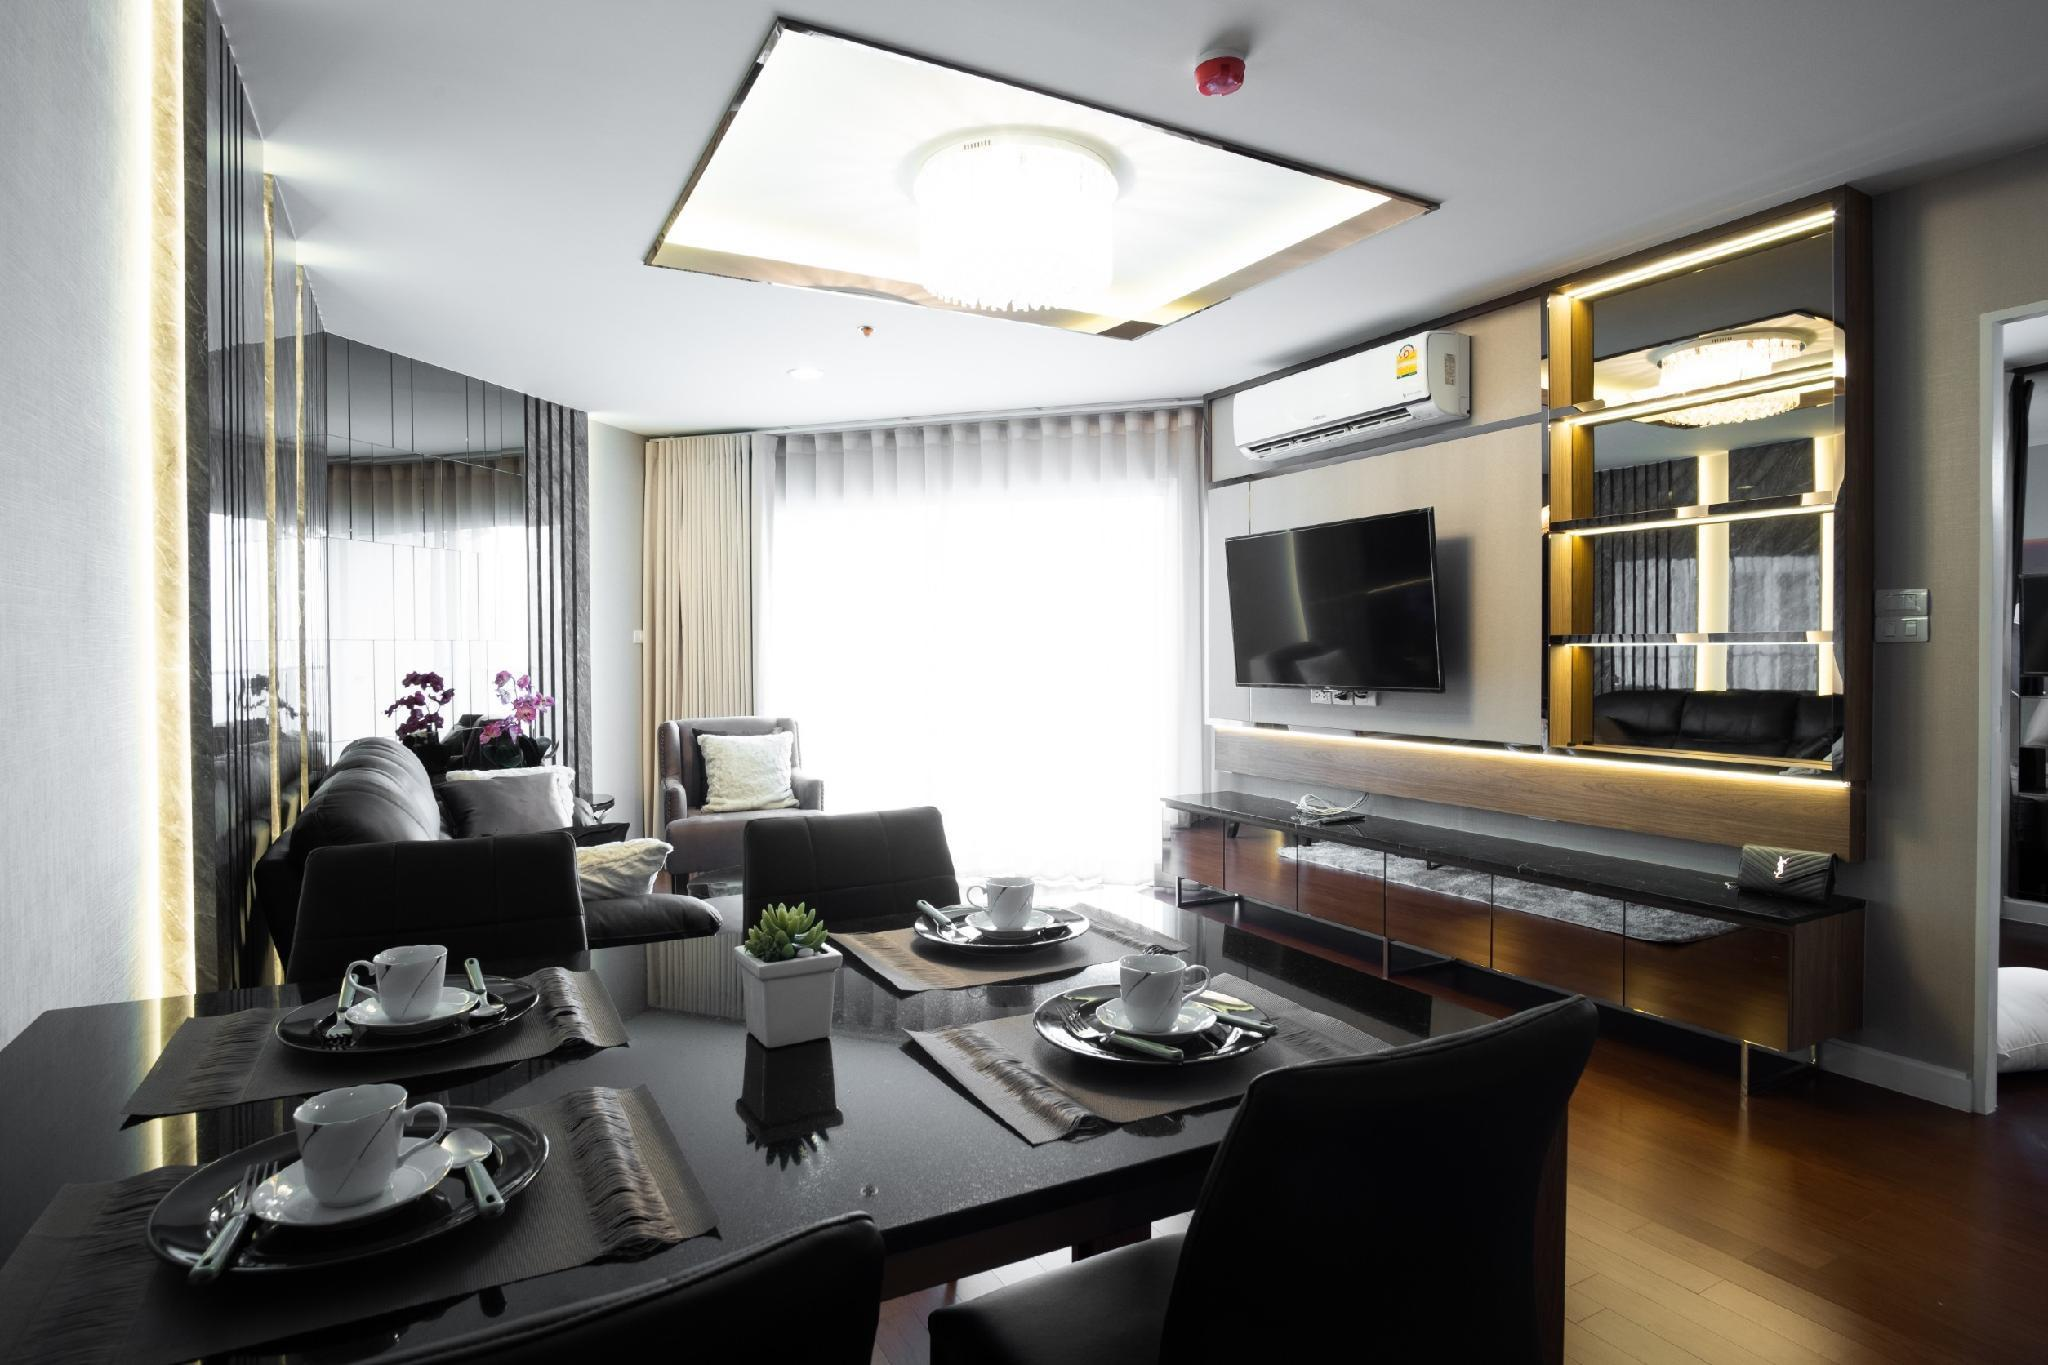 LuxuryDuplex belle condo/Subway Rama9/3BR/BKK/Wifi อพาร์ตเมนต์ 3 ห้องนอน 3 ห้องน้ำส่วนตัว ขนาด 109 ตร.ม. – รัชดาภิเษก